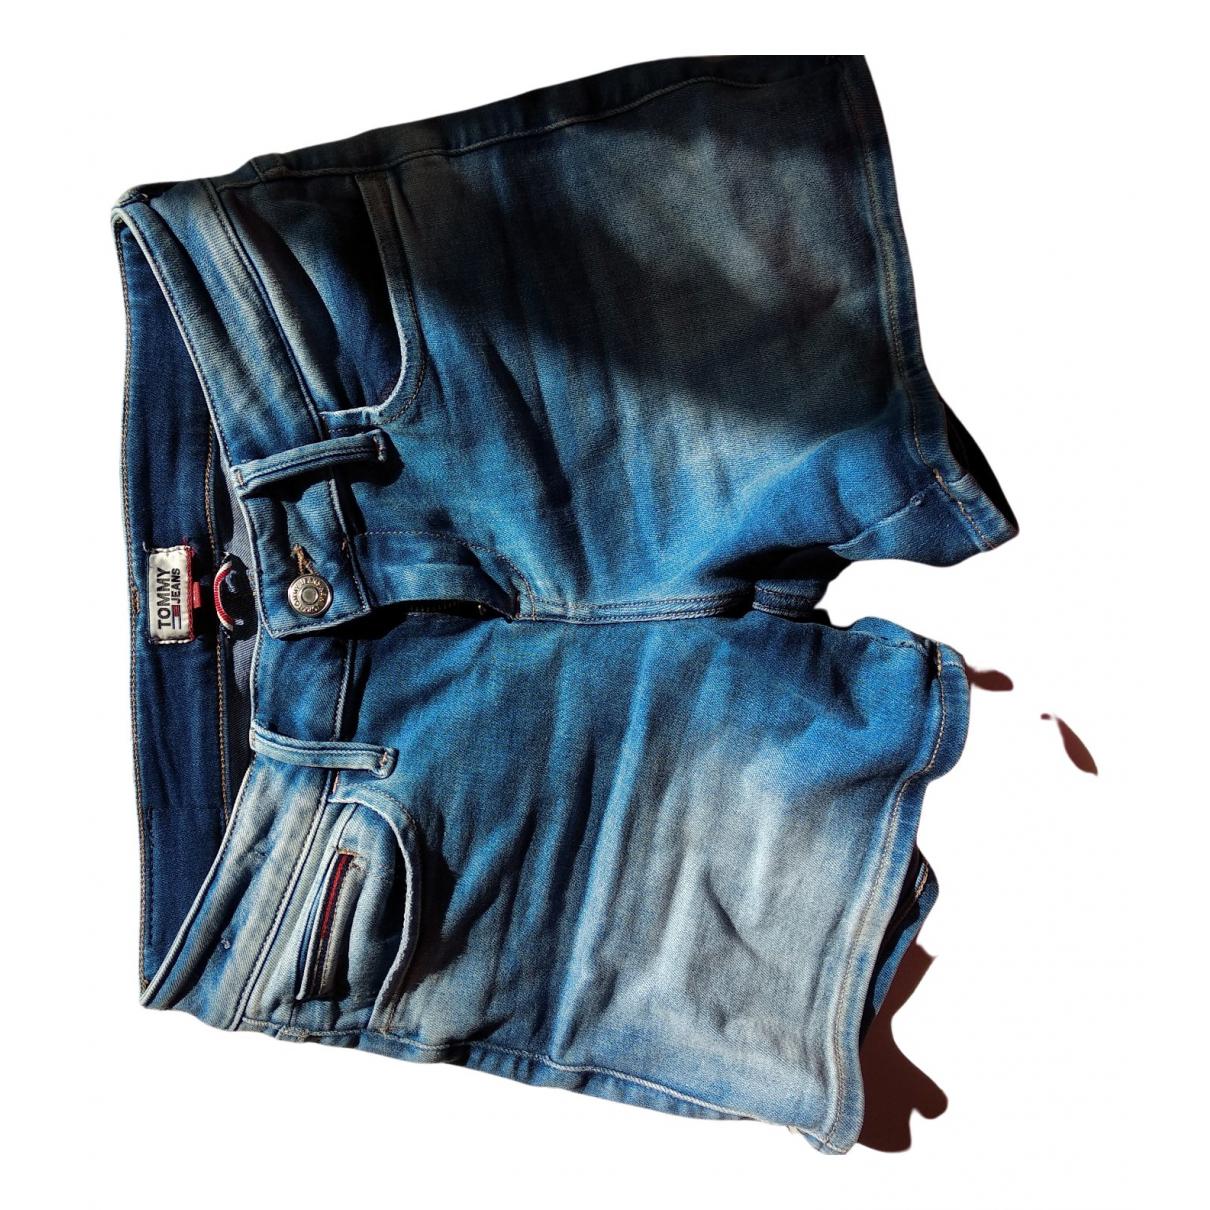 Tommy Jeans \N Jeans in  Blau Denim - Jeans